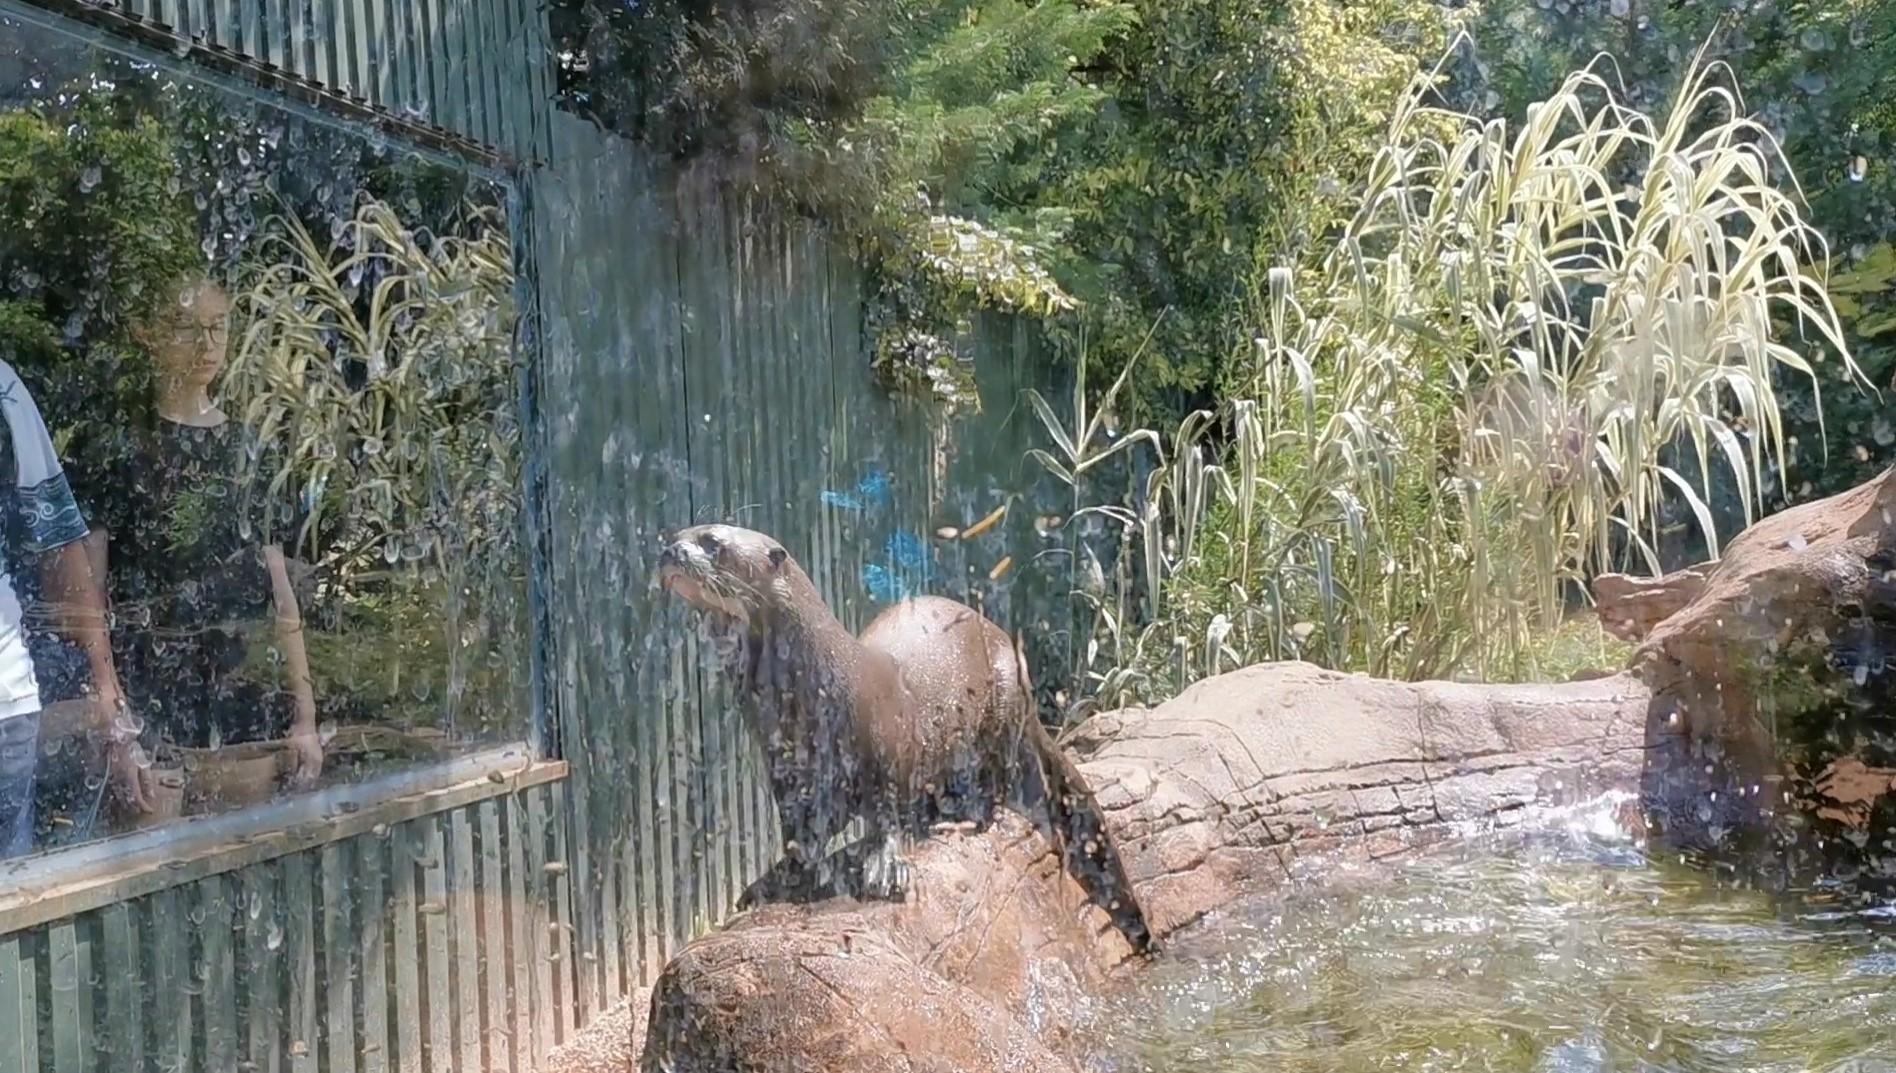 Budapest Zoo-giant river otter-animal